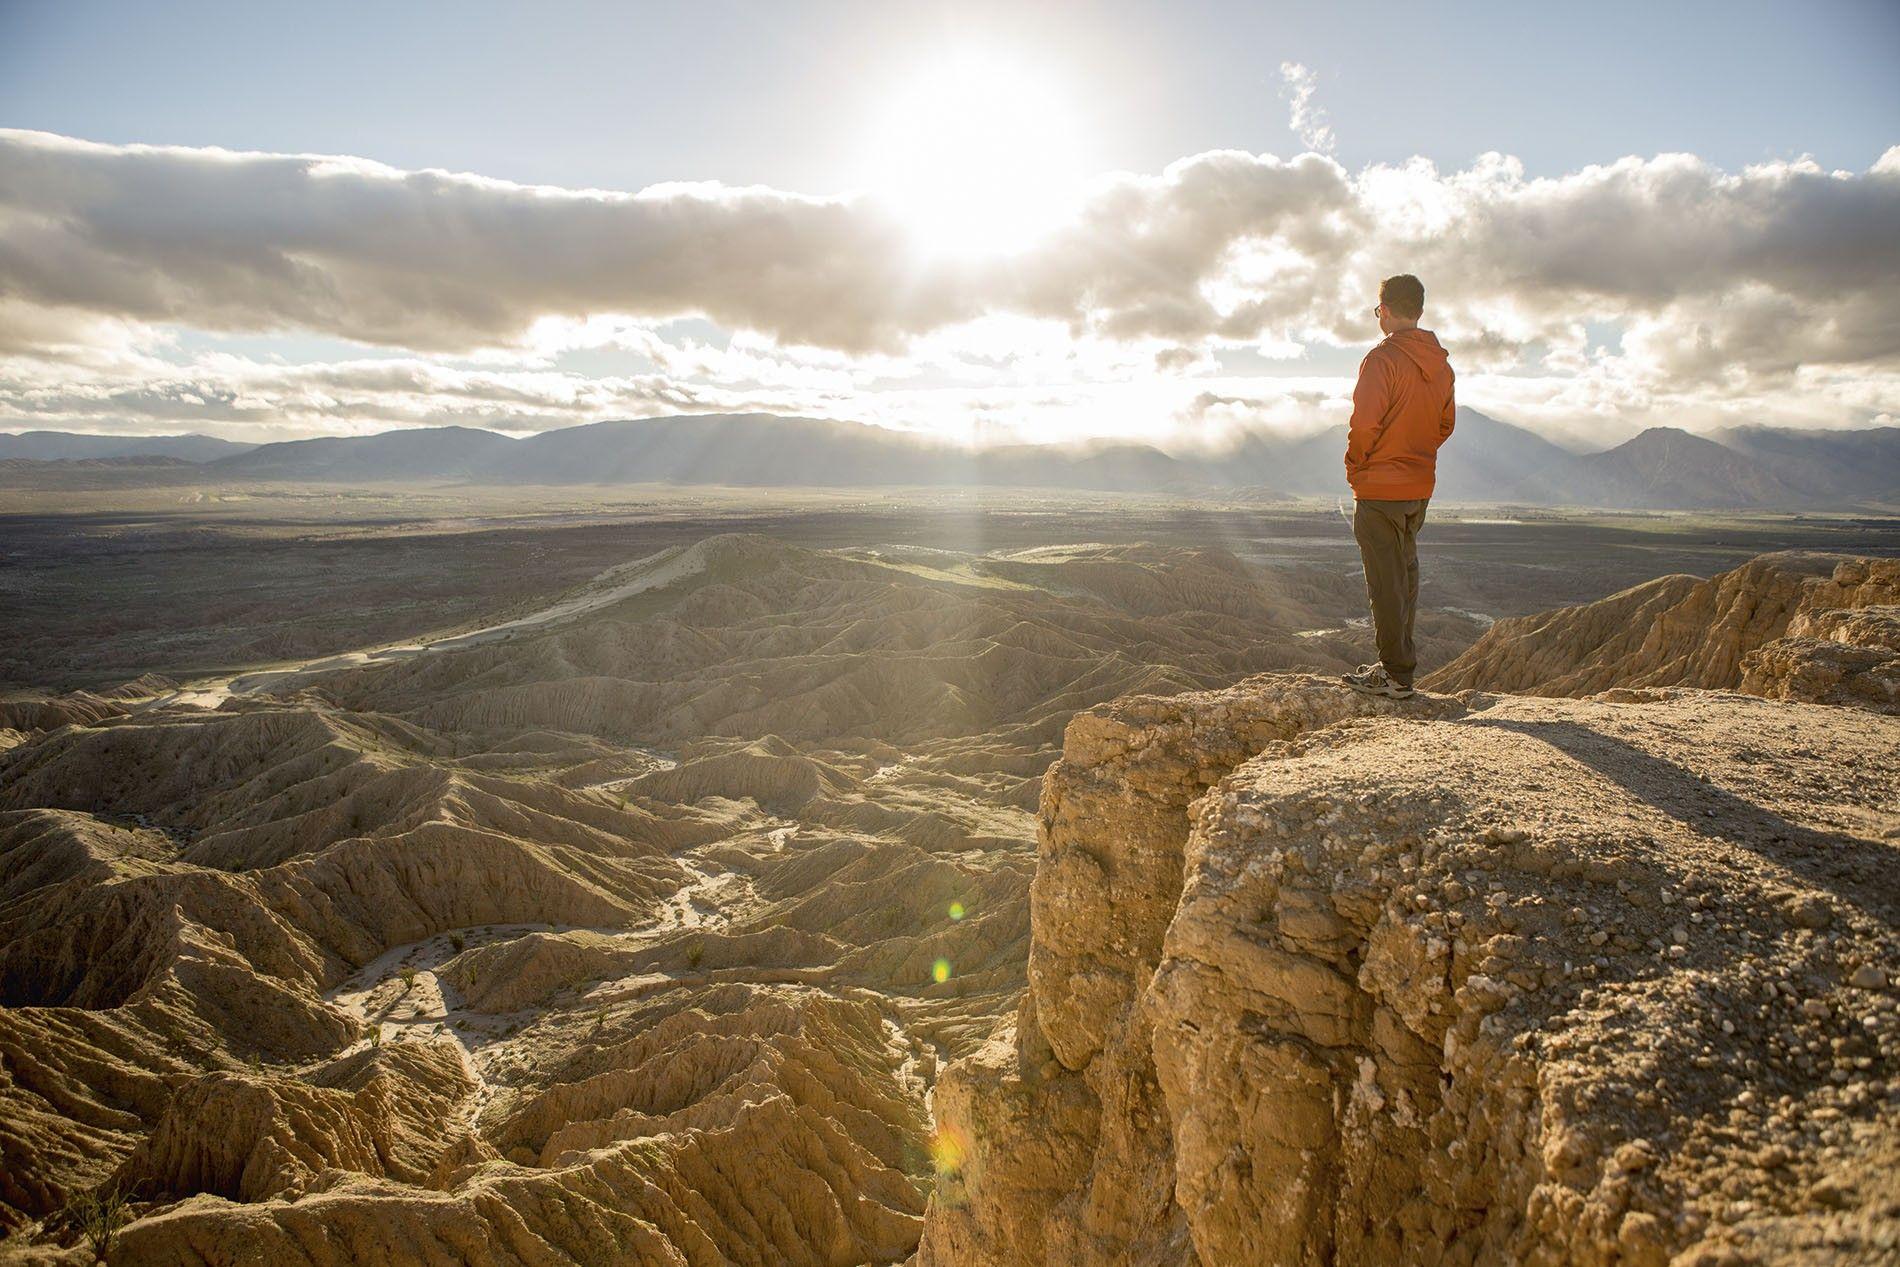 View over Borrego Badlands, California desert